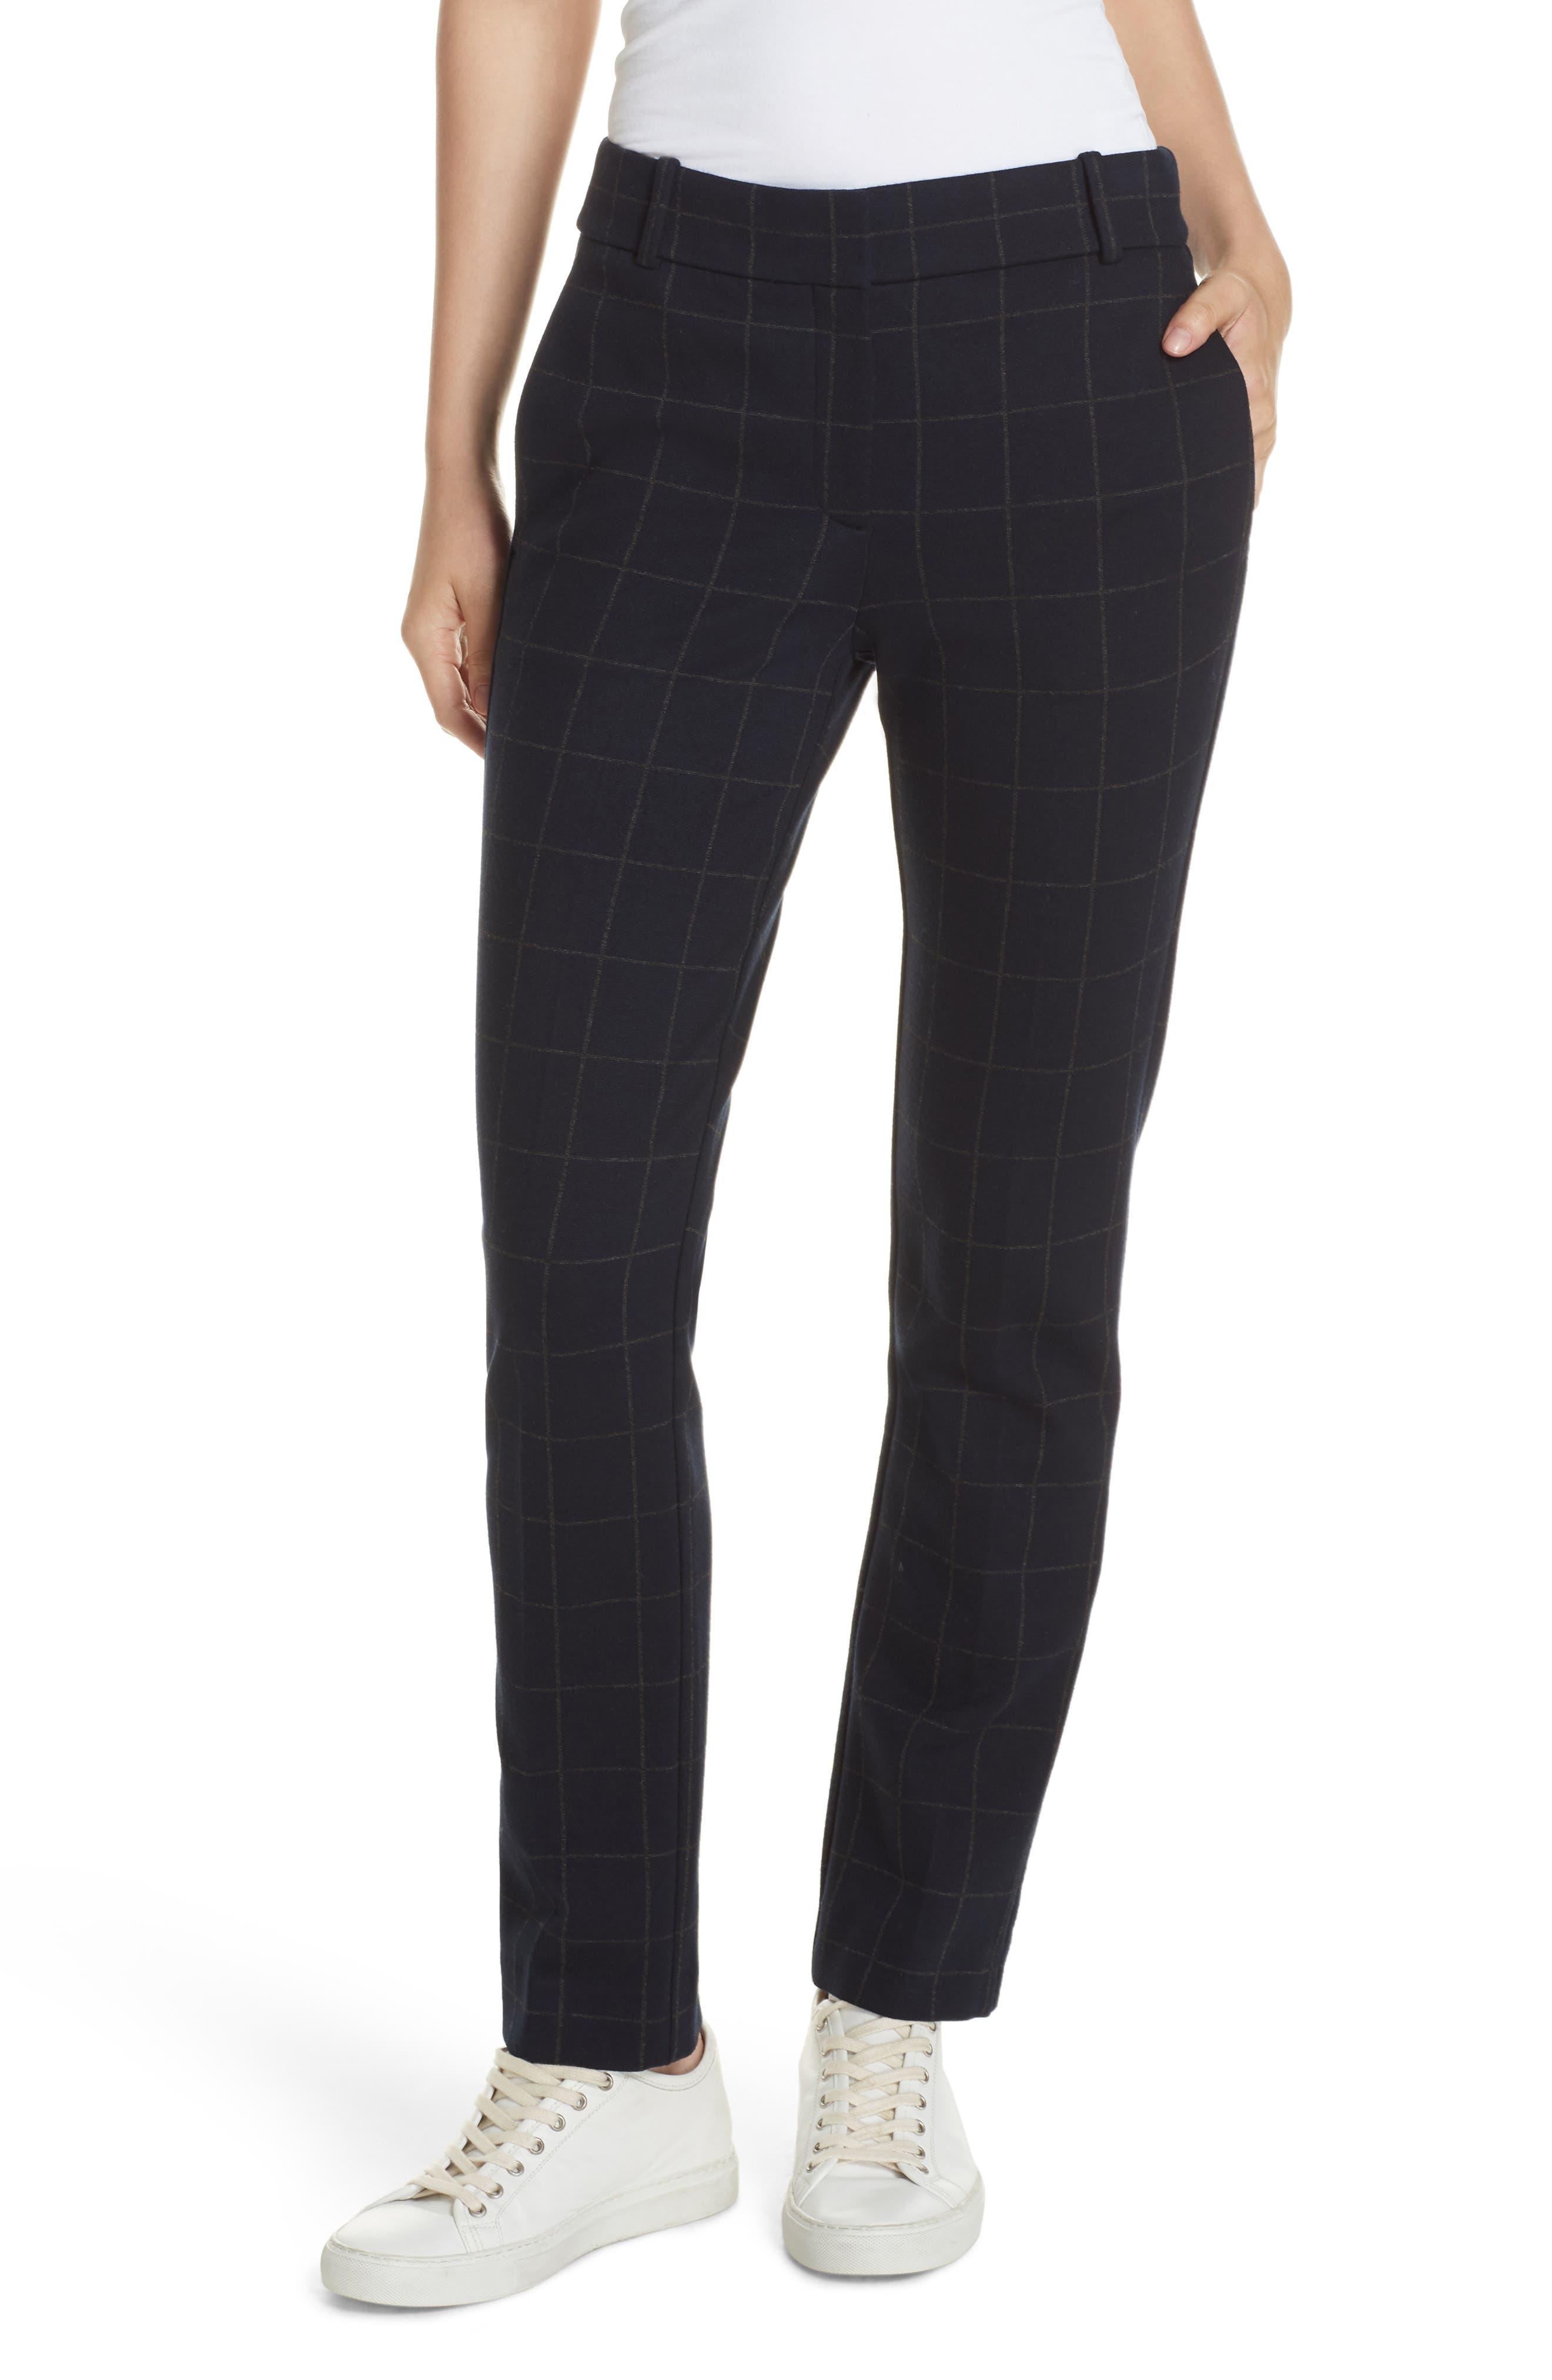 Straight-Leg Windowpane-Check Knit Trousers in Deep Navy/ Charcoal Melange